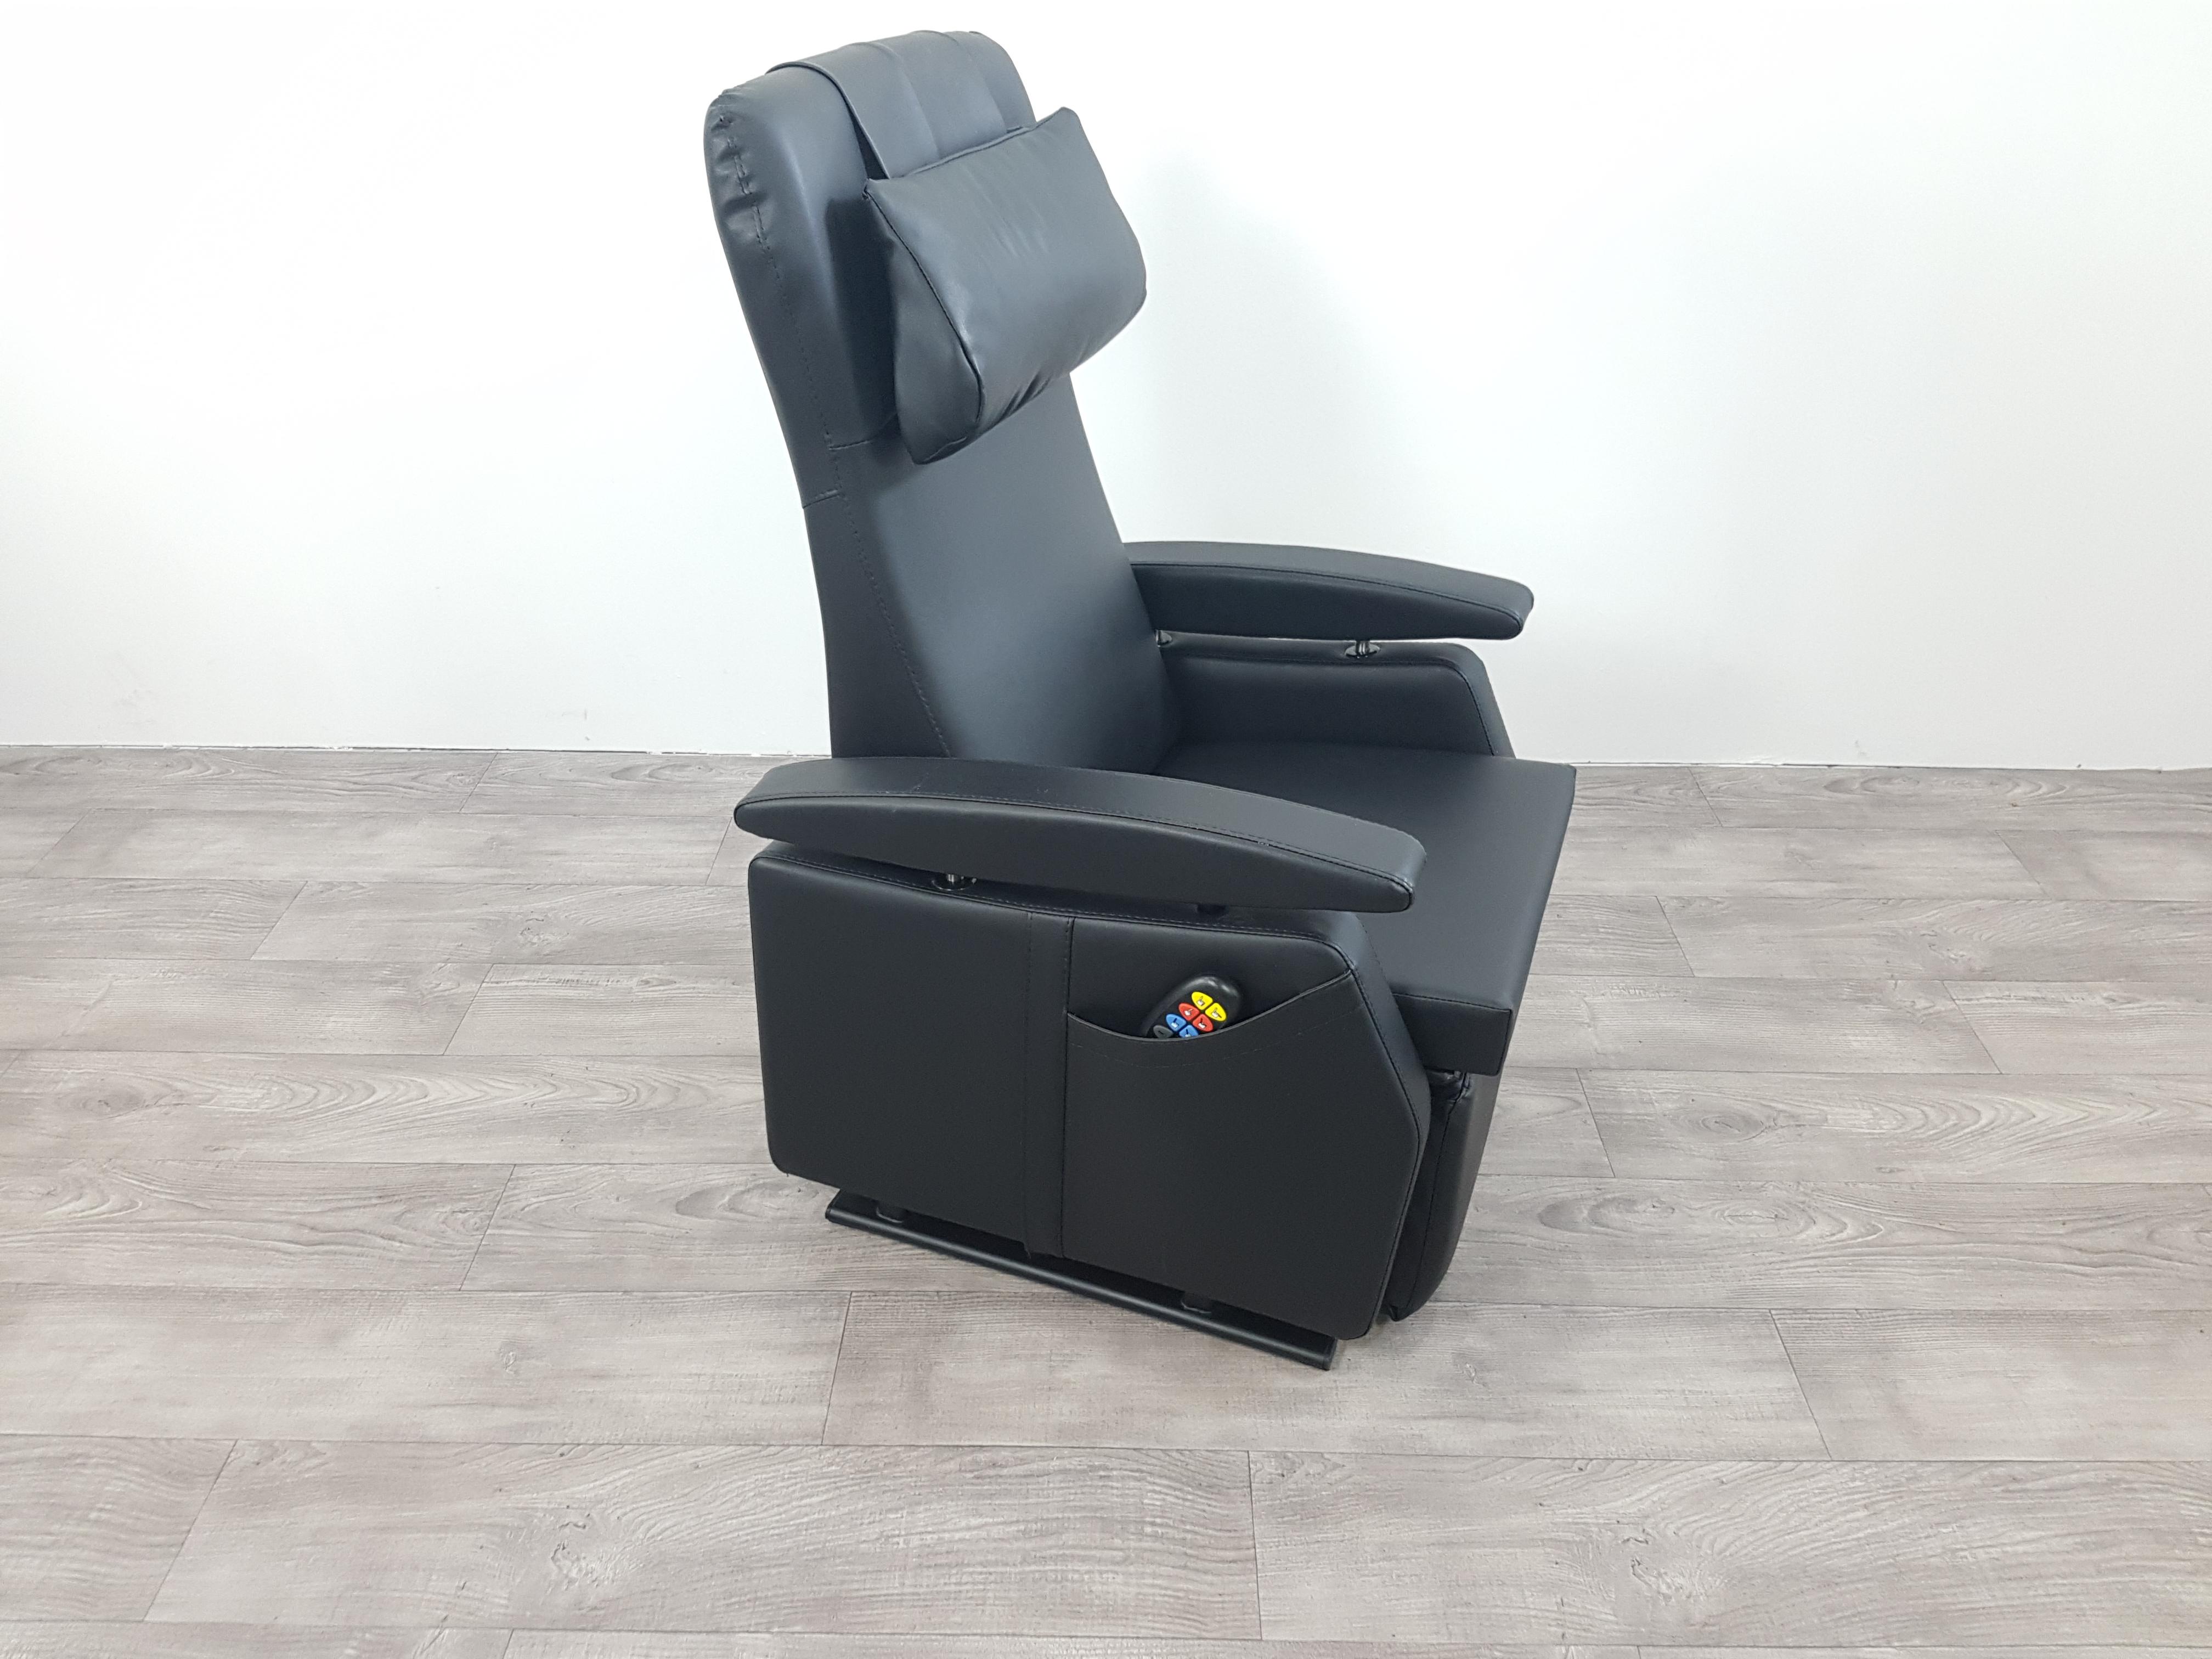 Sta Zit Stoel : Sta op stoel vario model cm smal zwart leder zeker zit